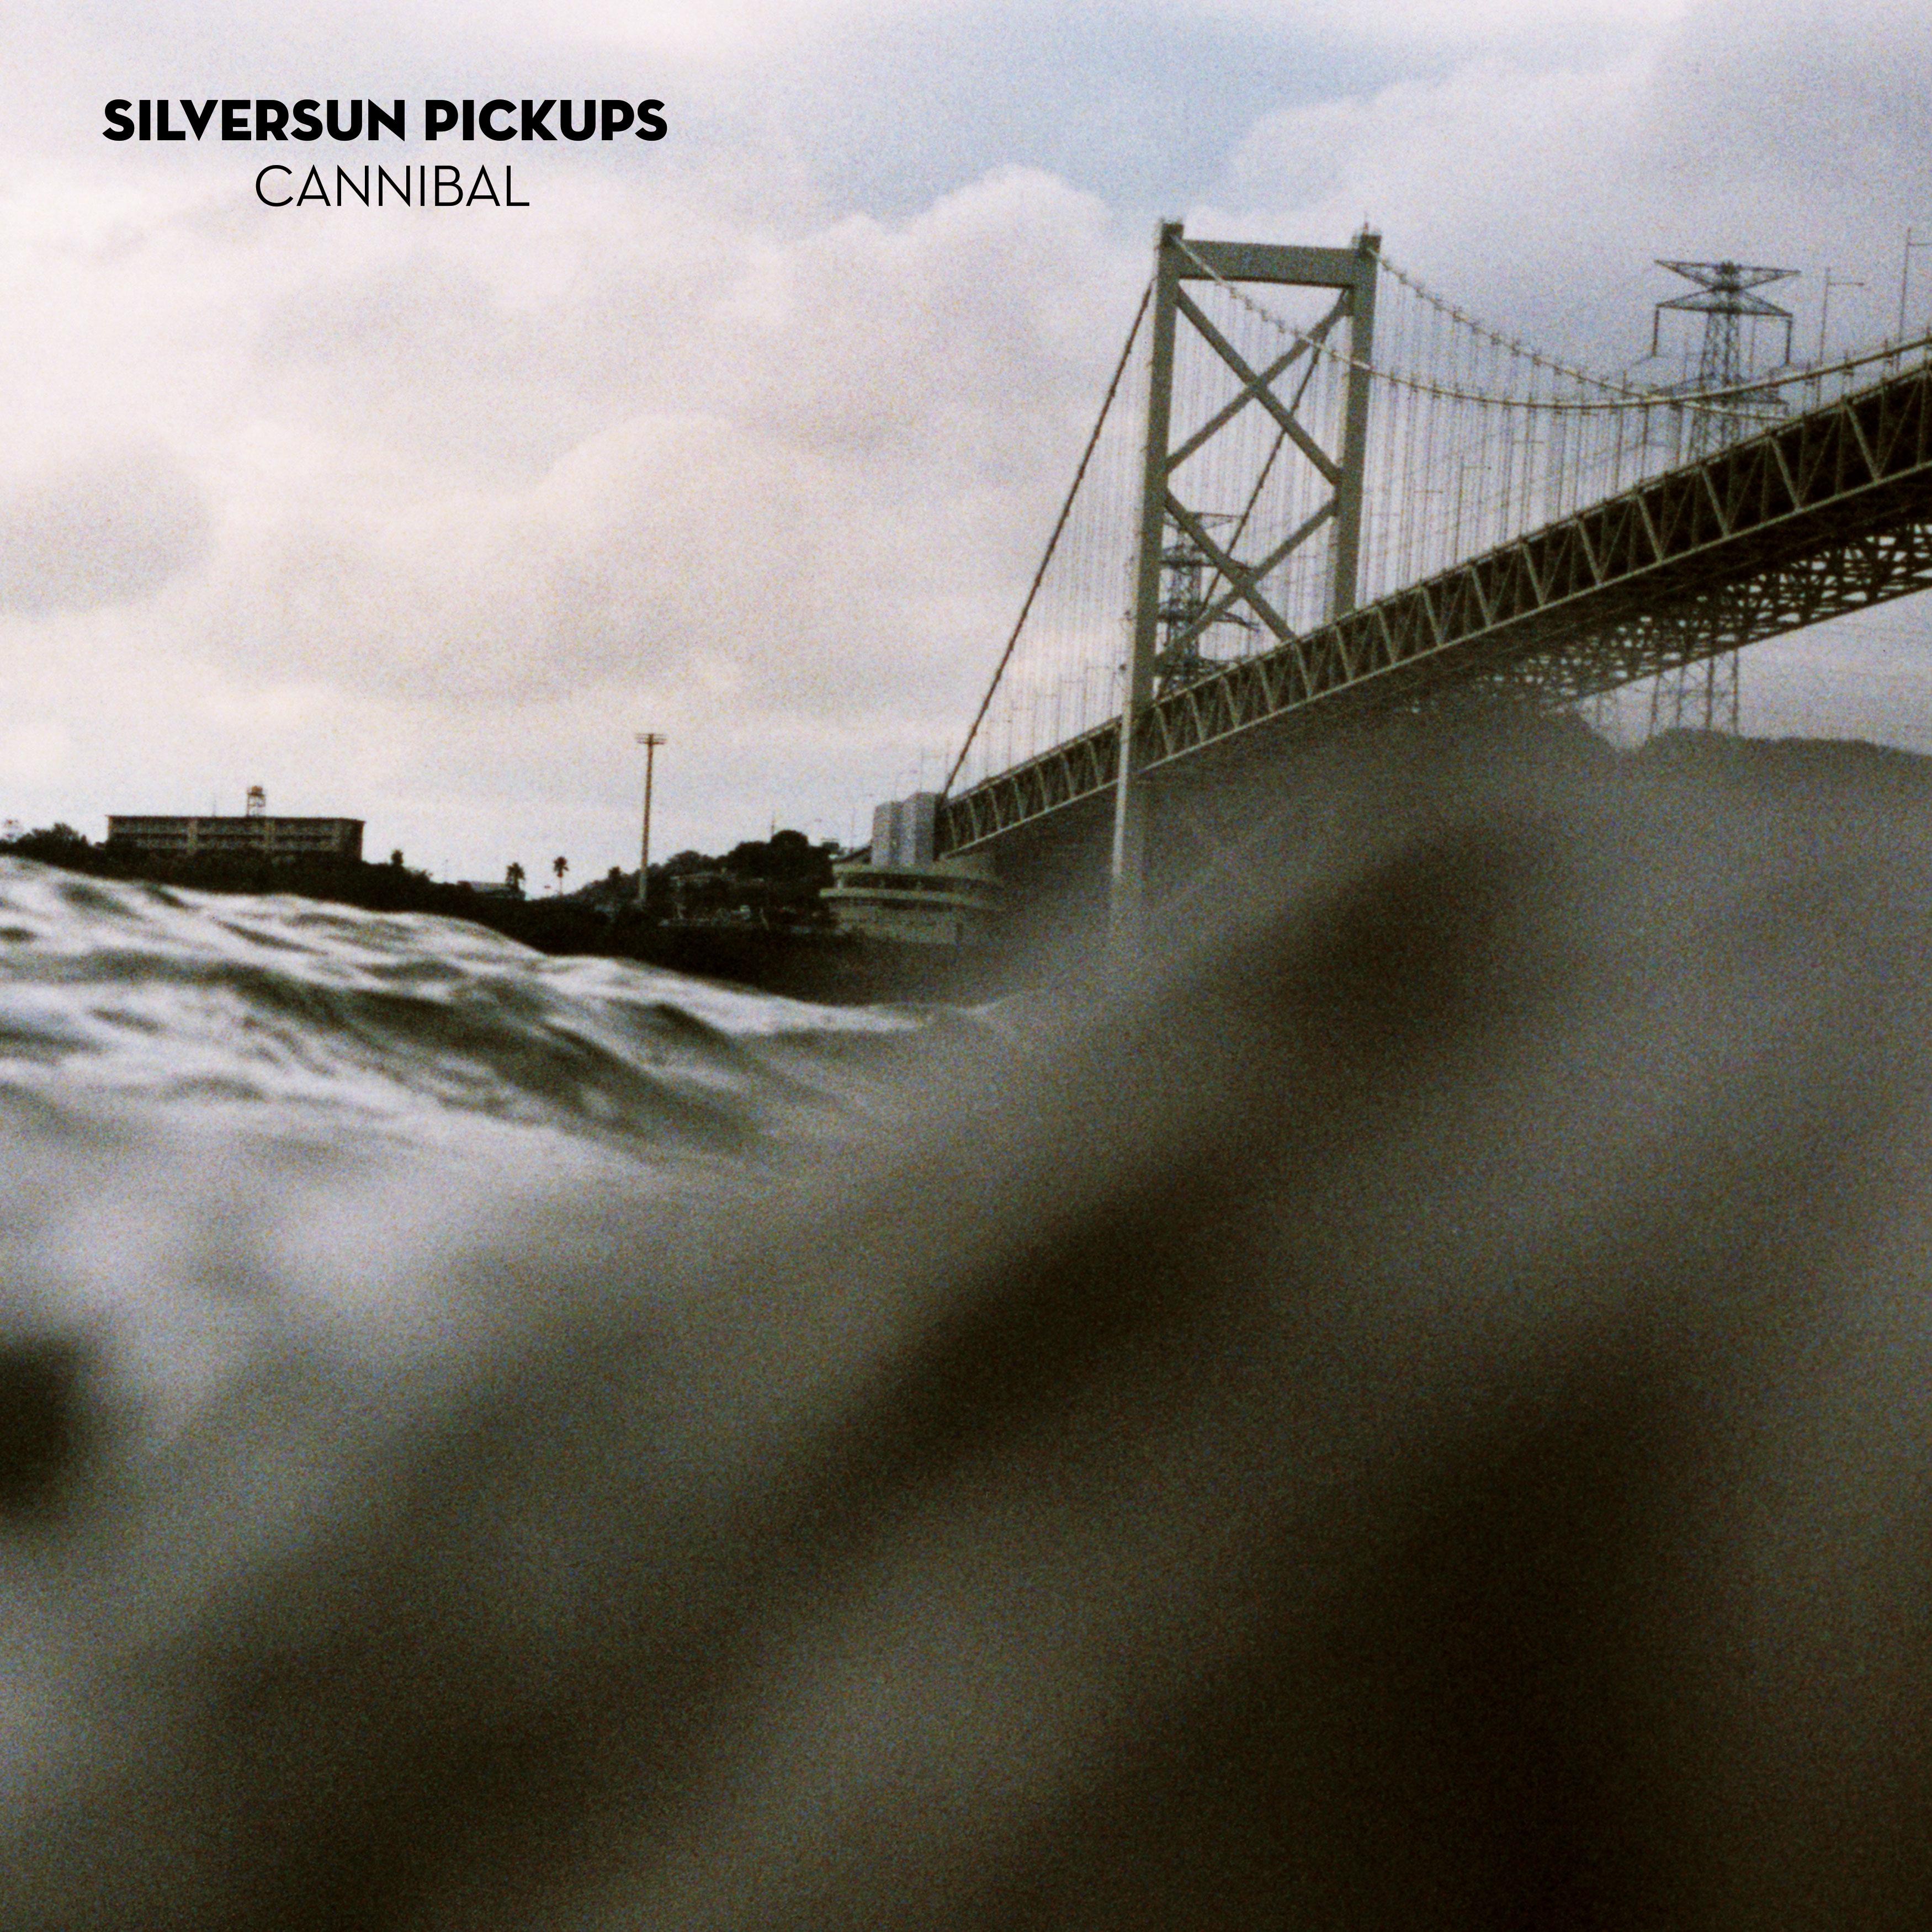 Silversun Pickups - cannibal рецензия на сингл